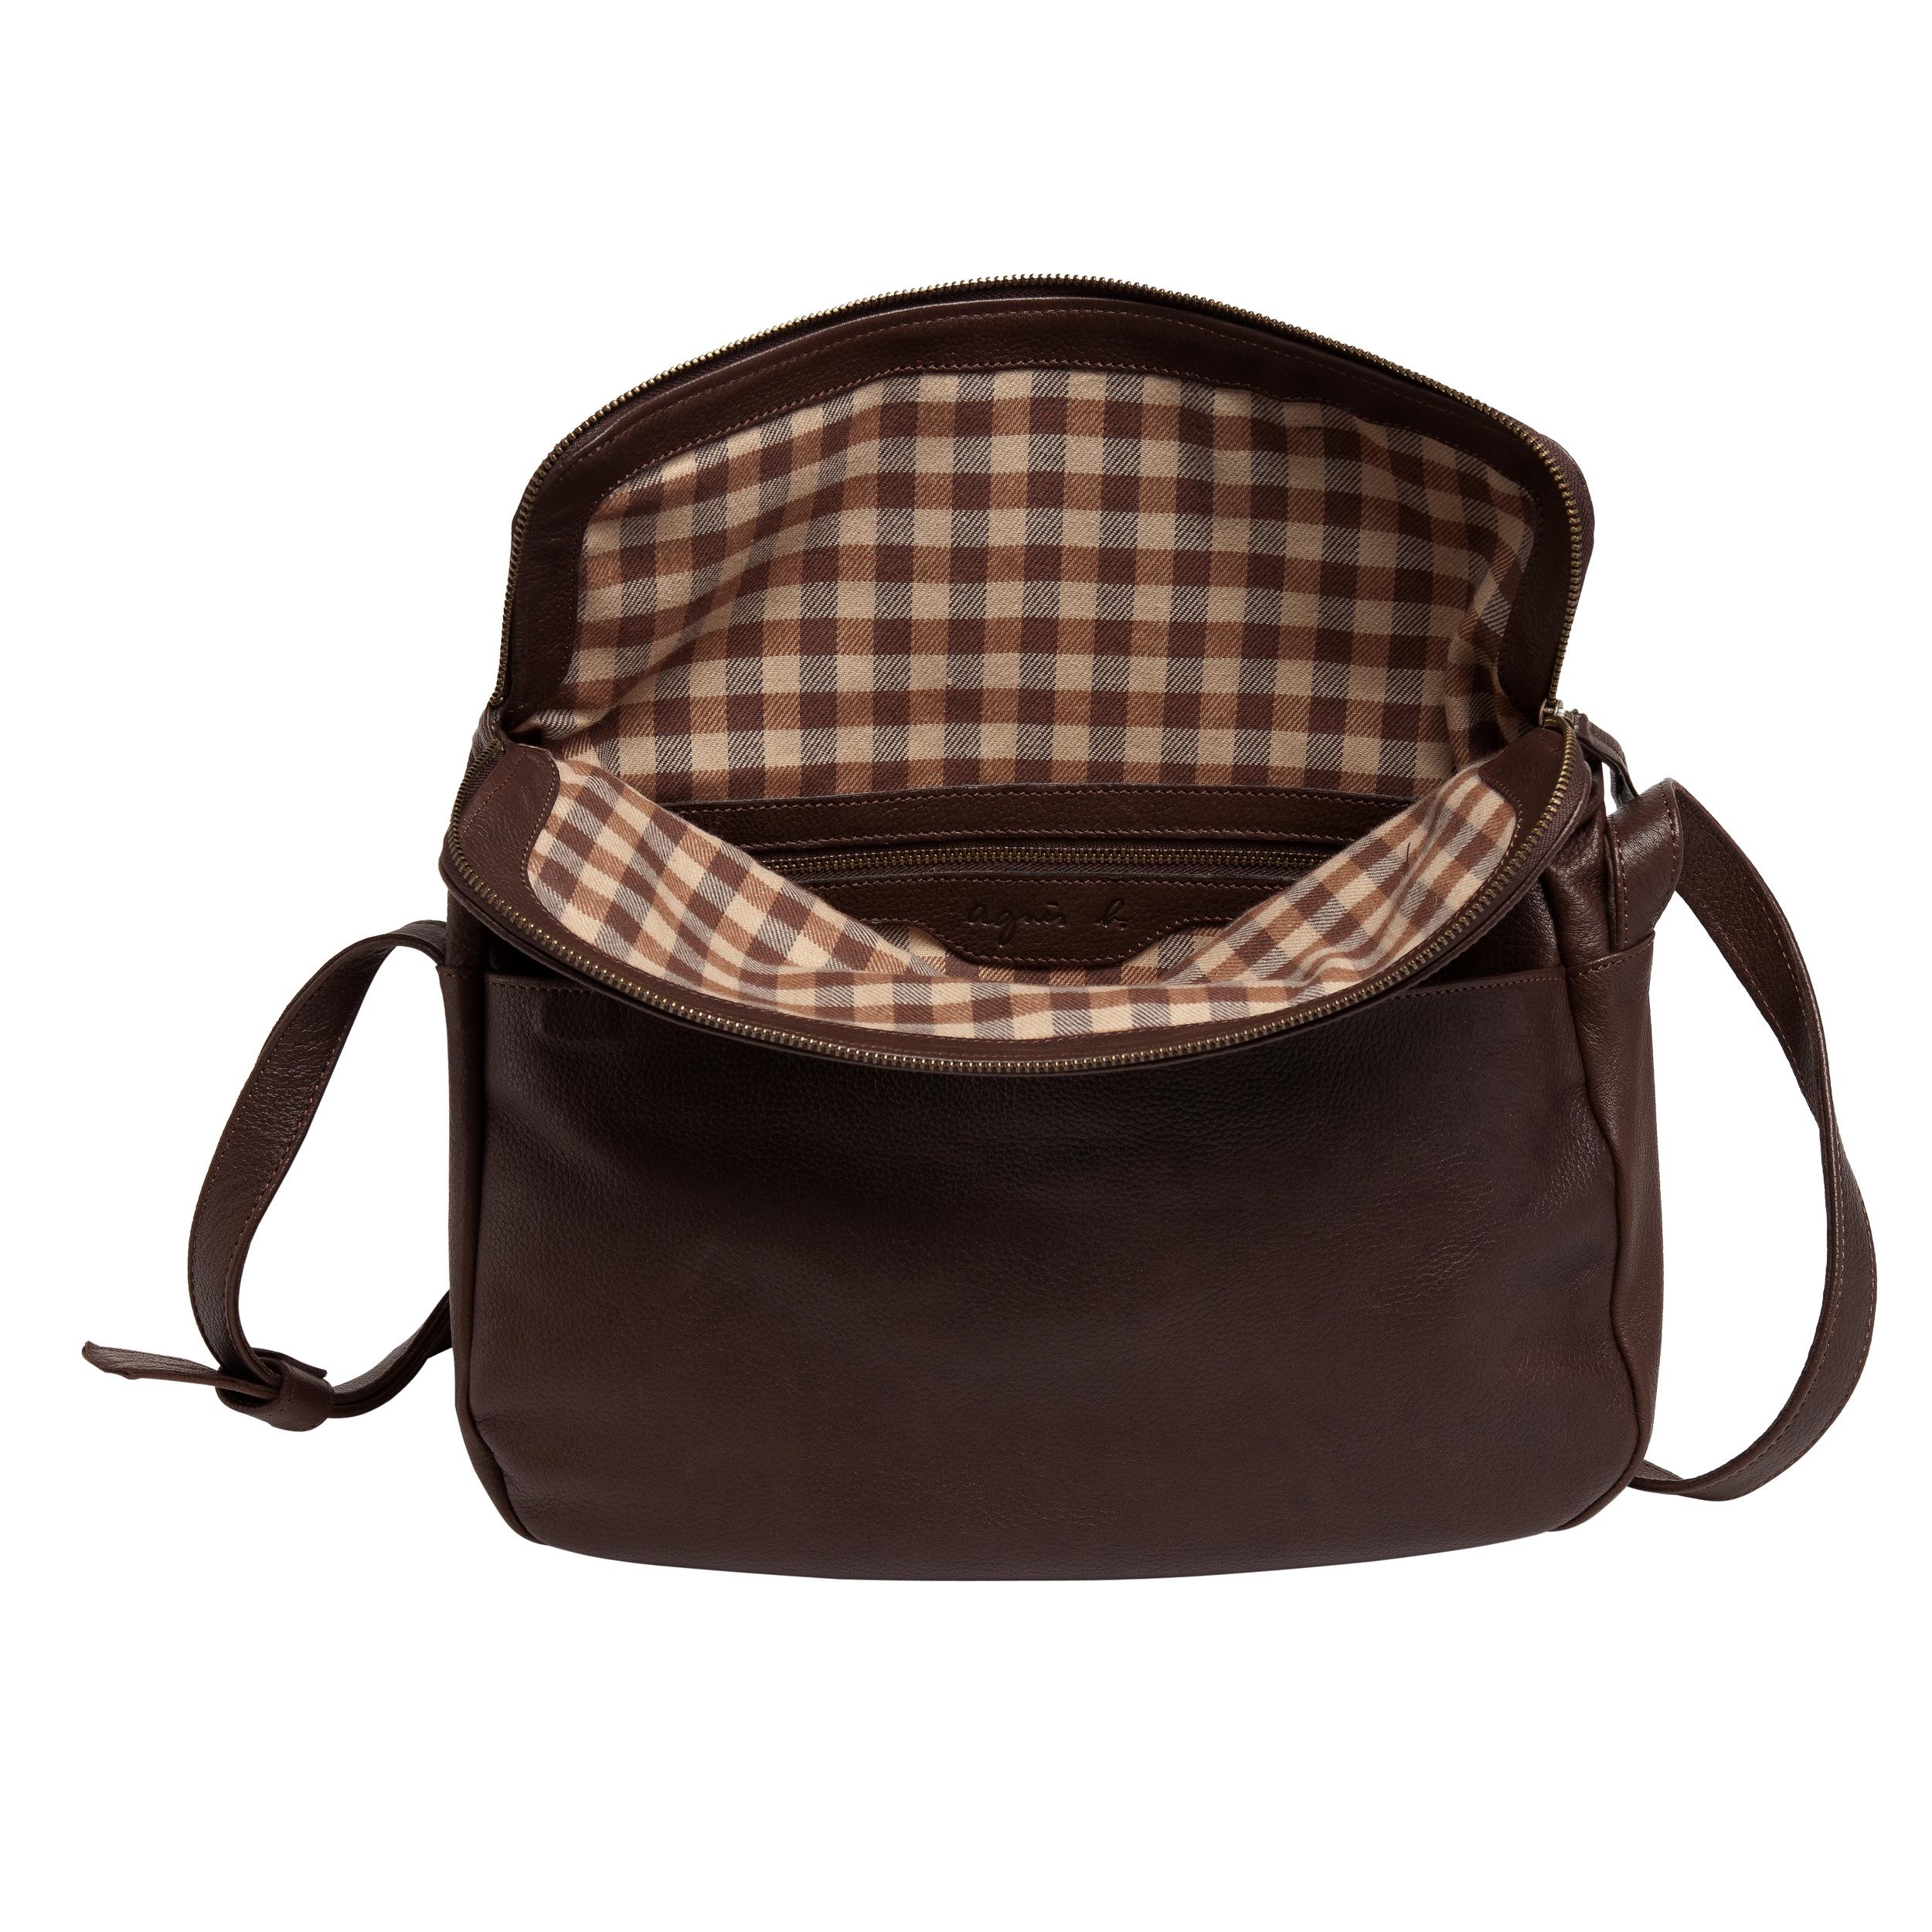 aa7181558a05 agnès b. Brown Bag Amelia in Brown - Lyst